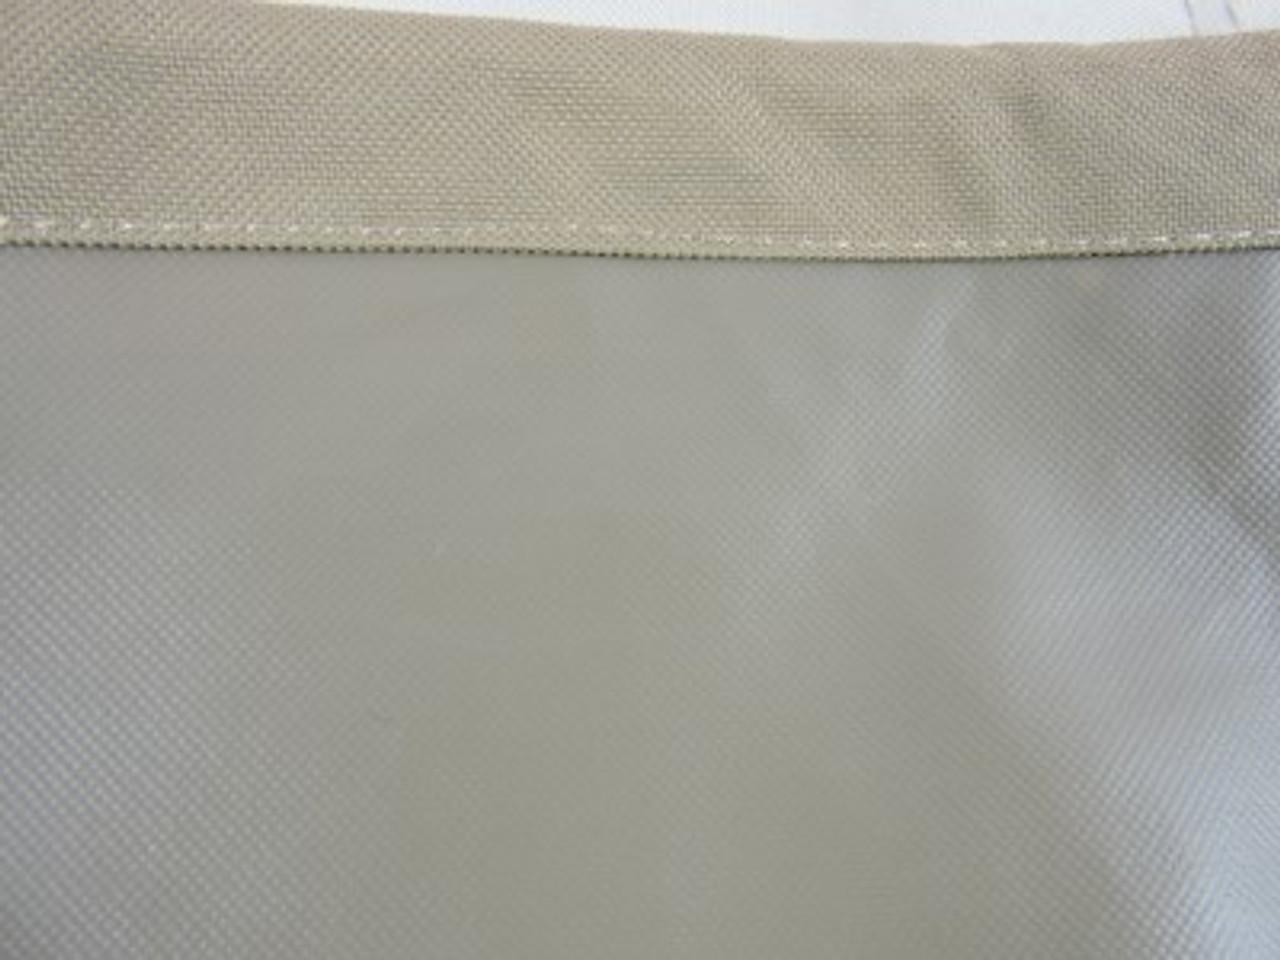 Savanna waterproof inner vinyl layer